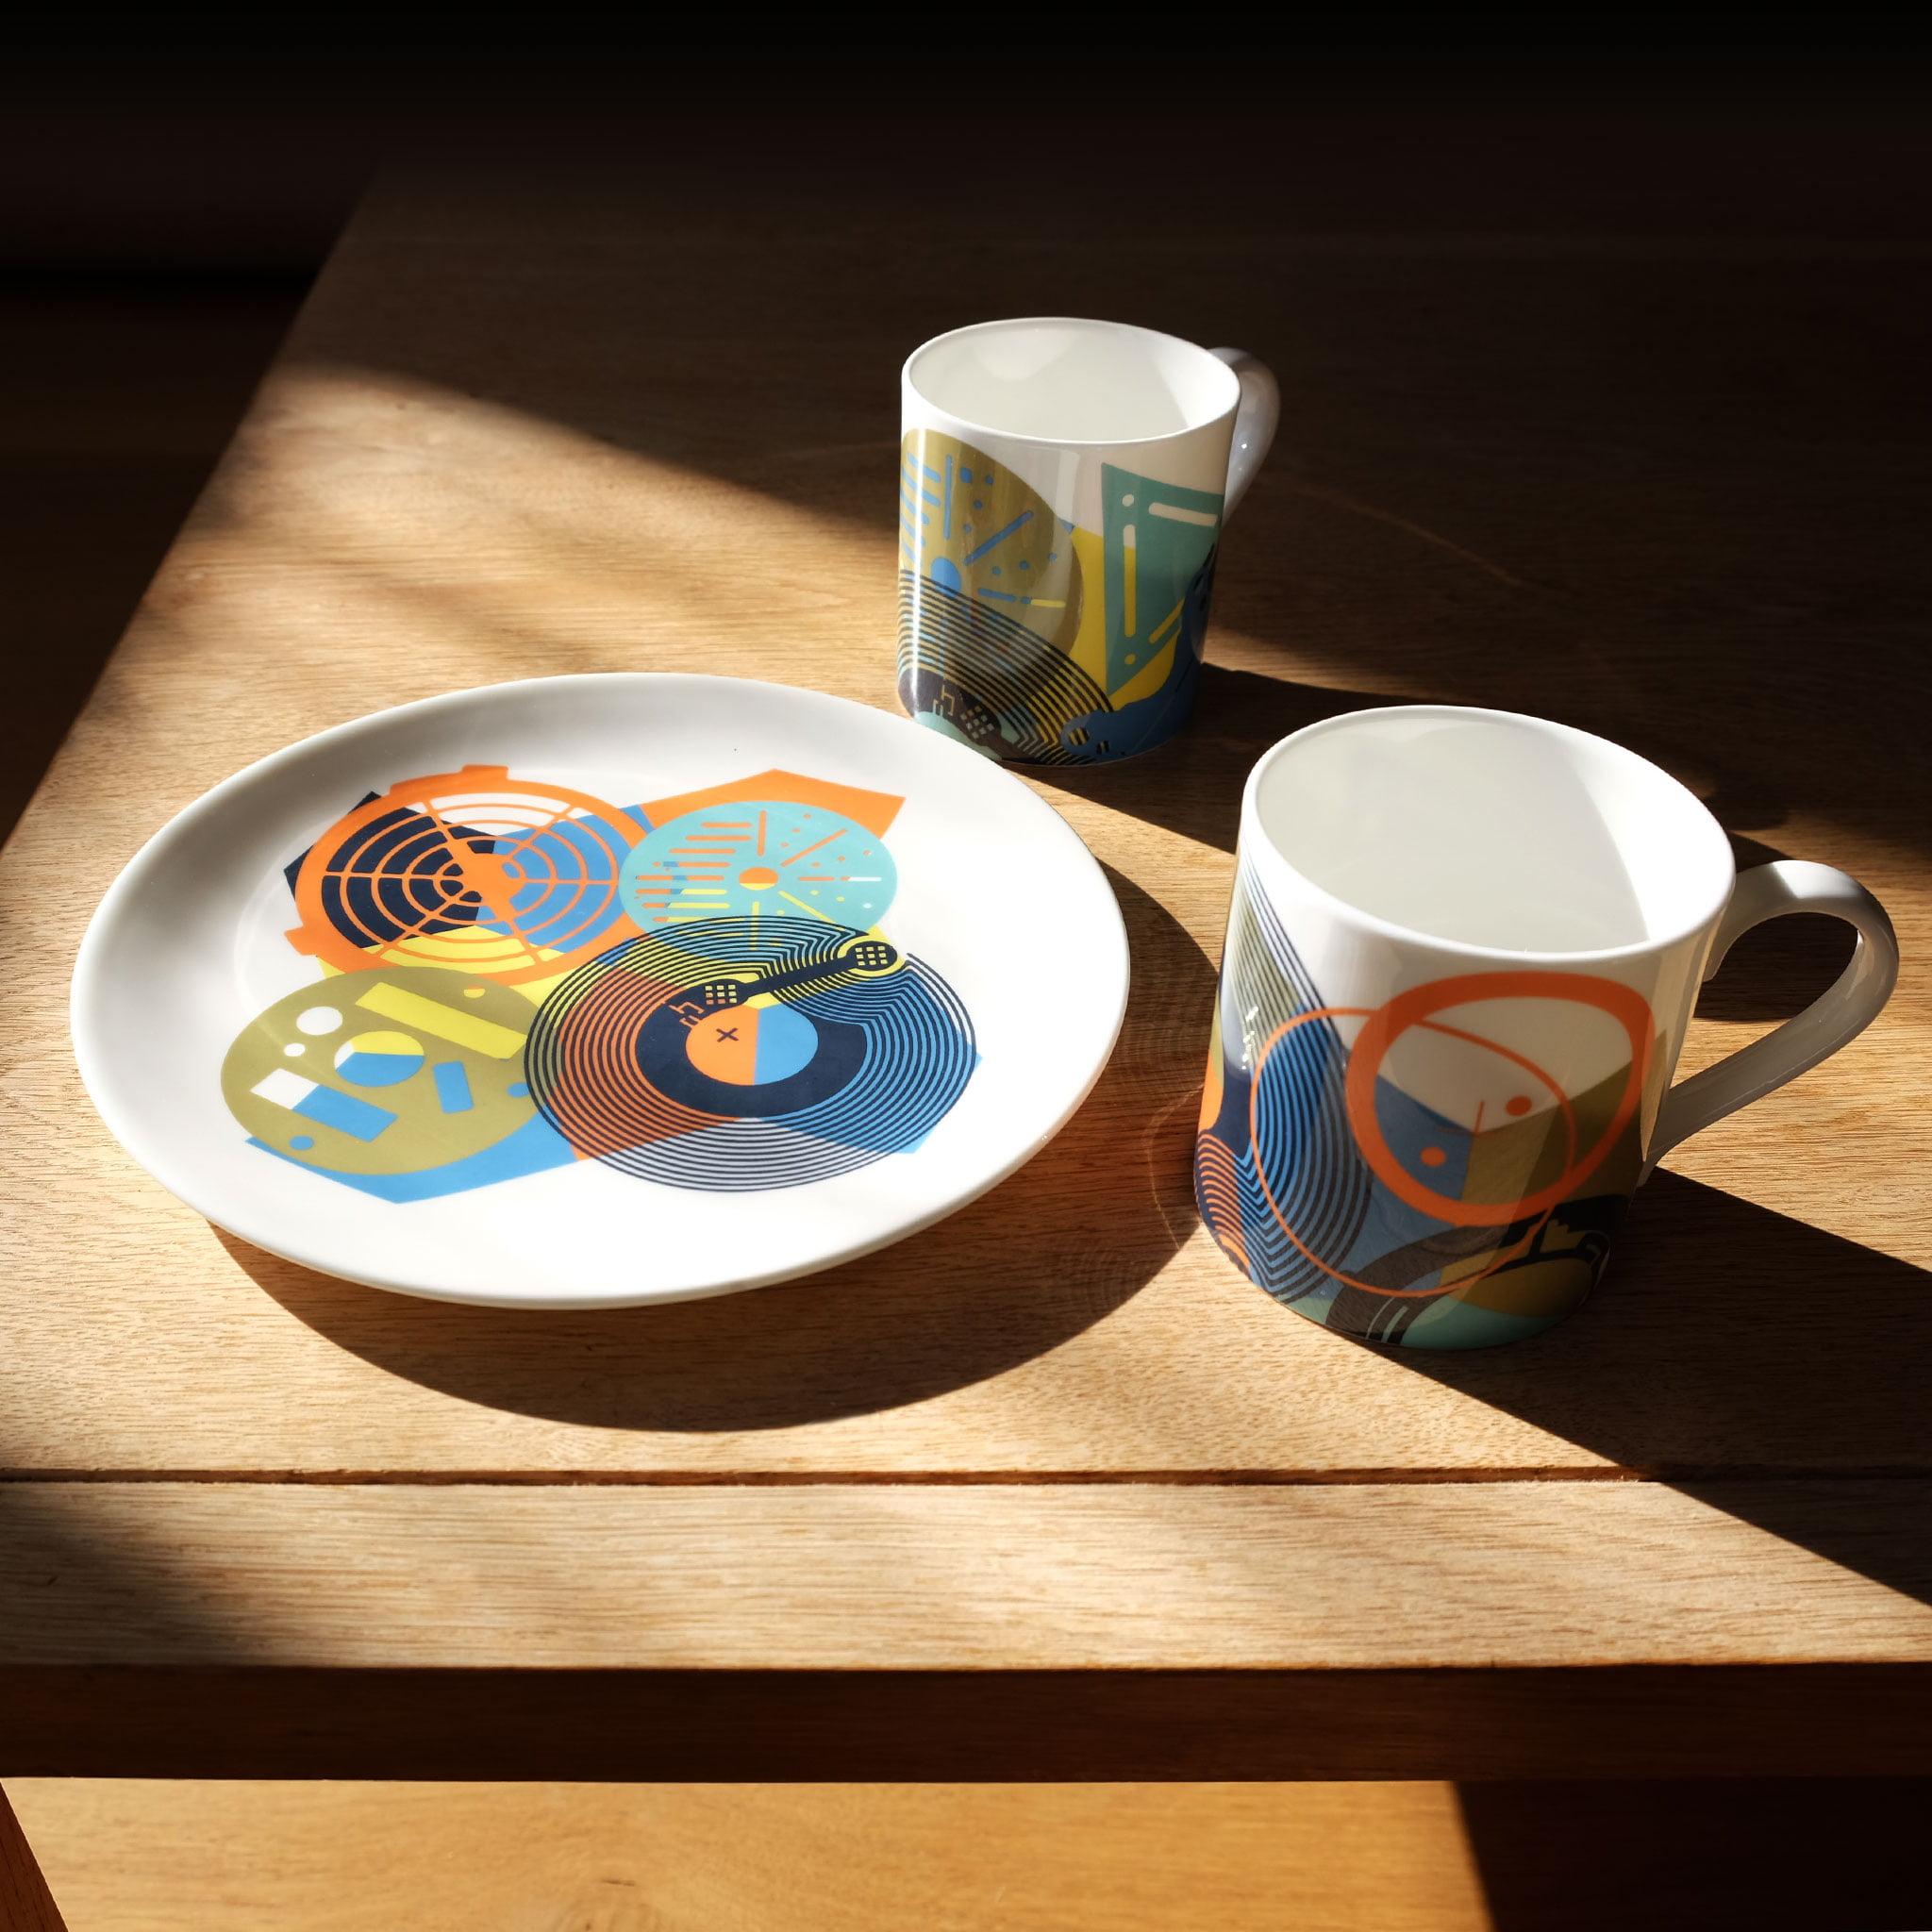 Mugs-and-plates-shadow-table-pic